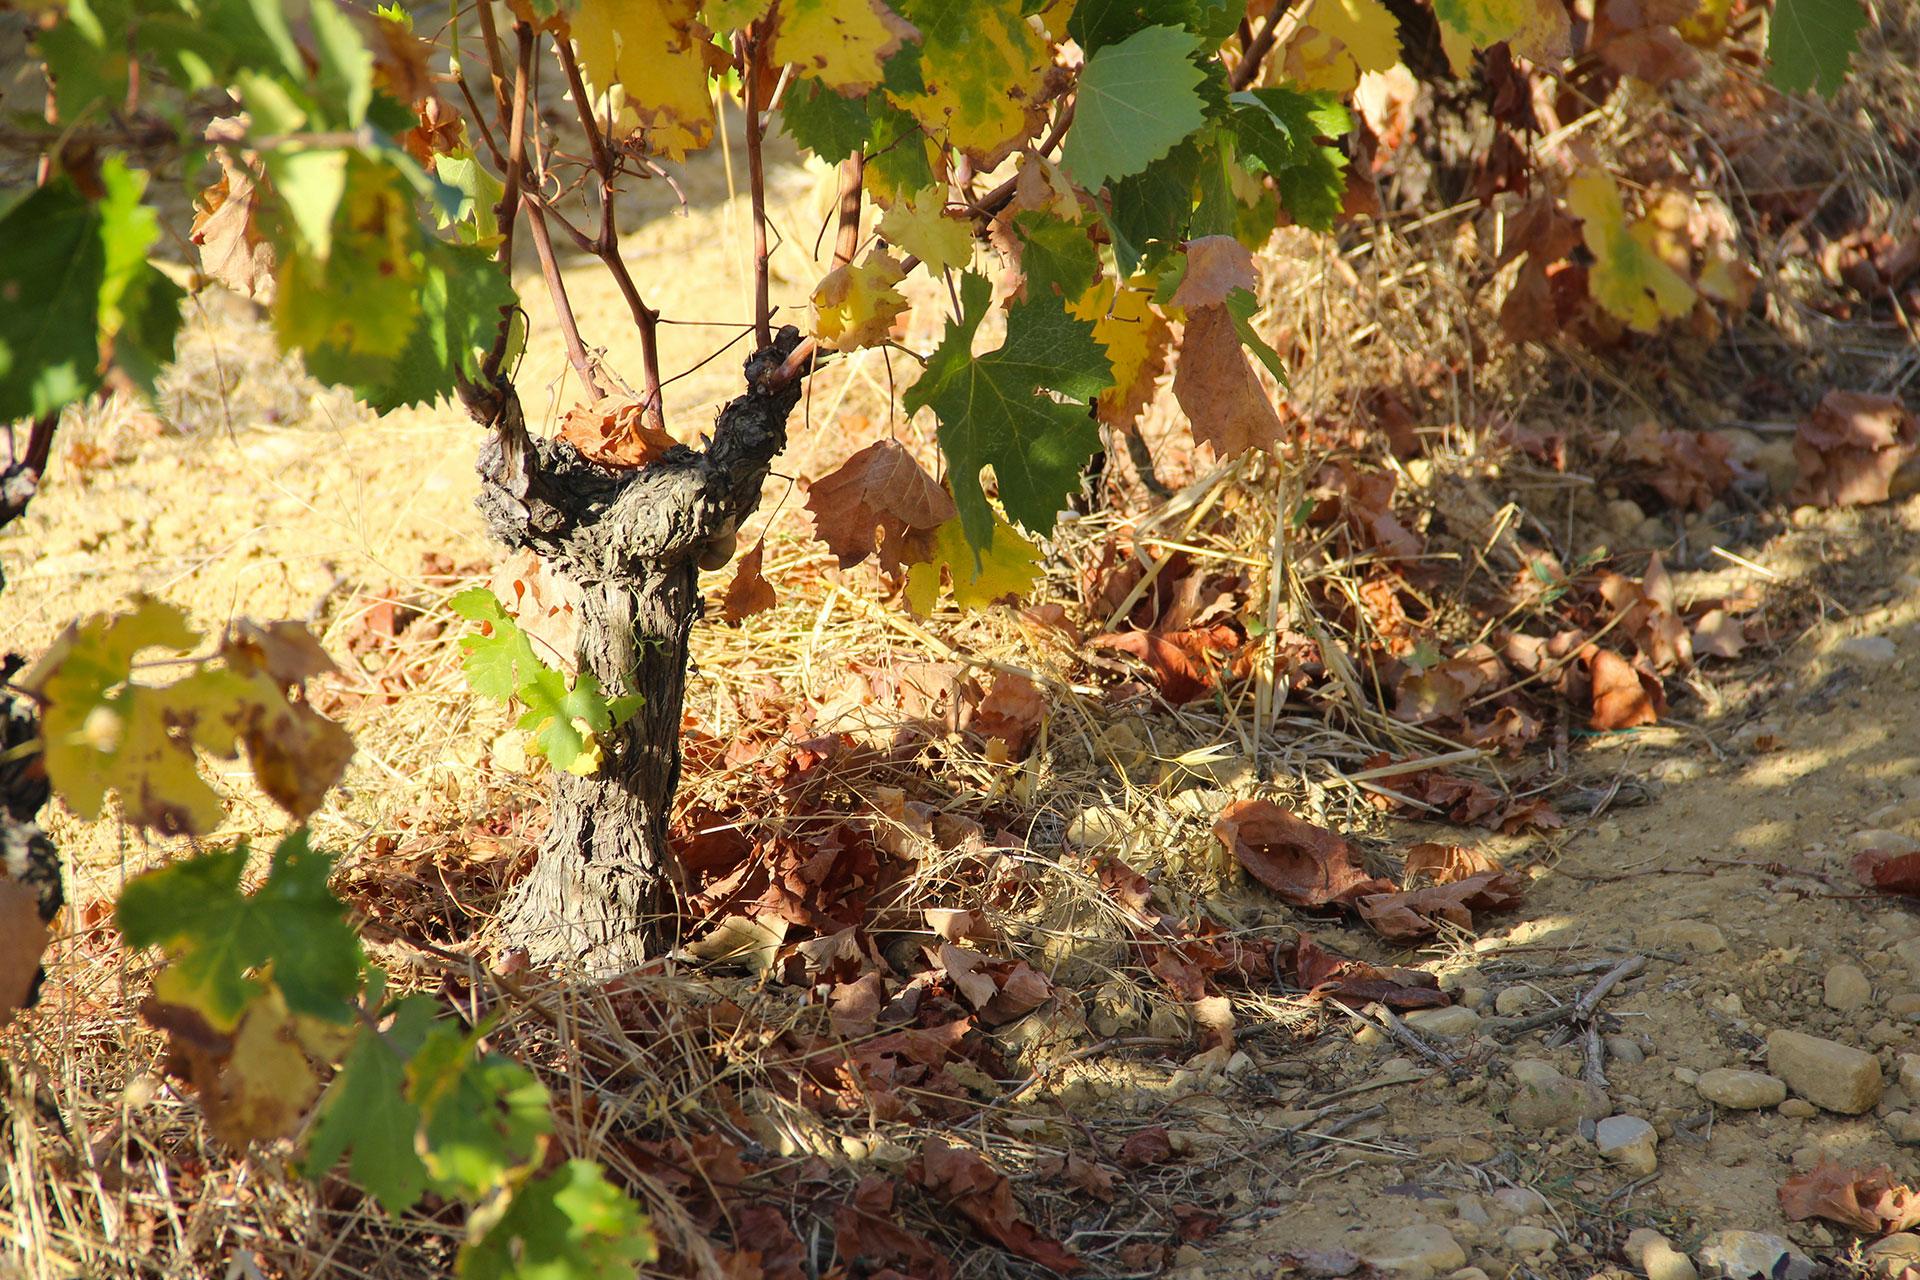 Vigne-Chabanon